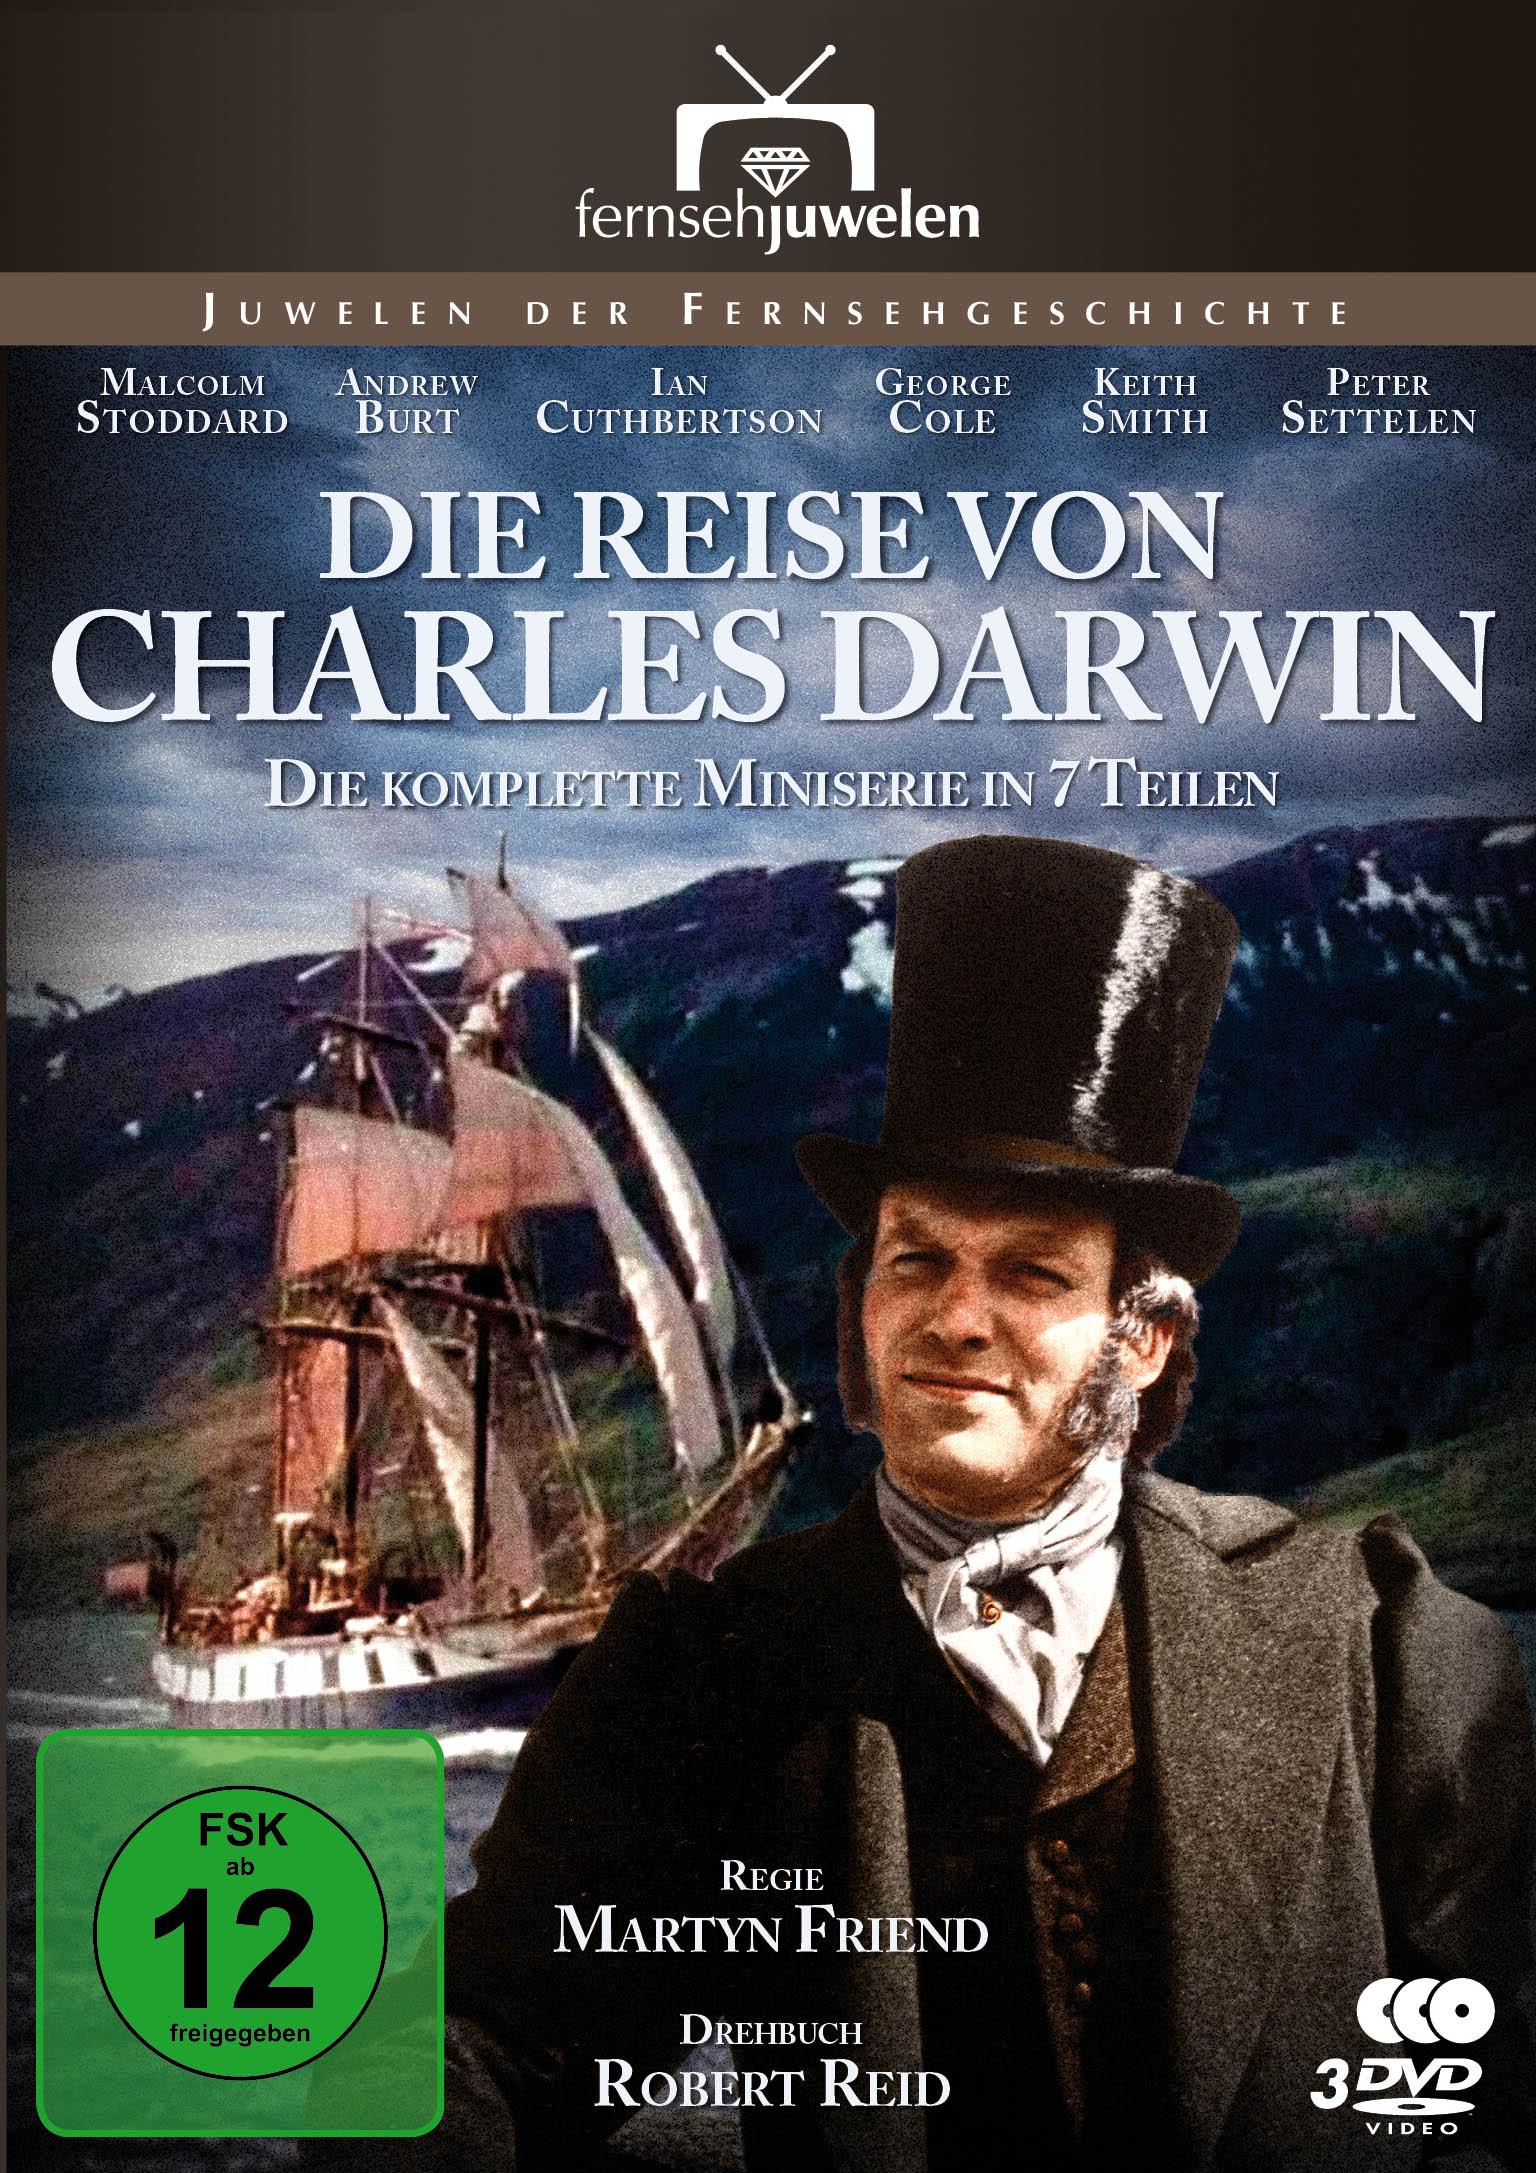 Image of Die Reise von Charles Darwin